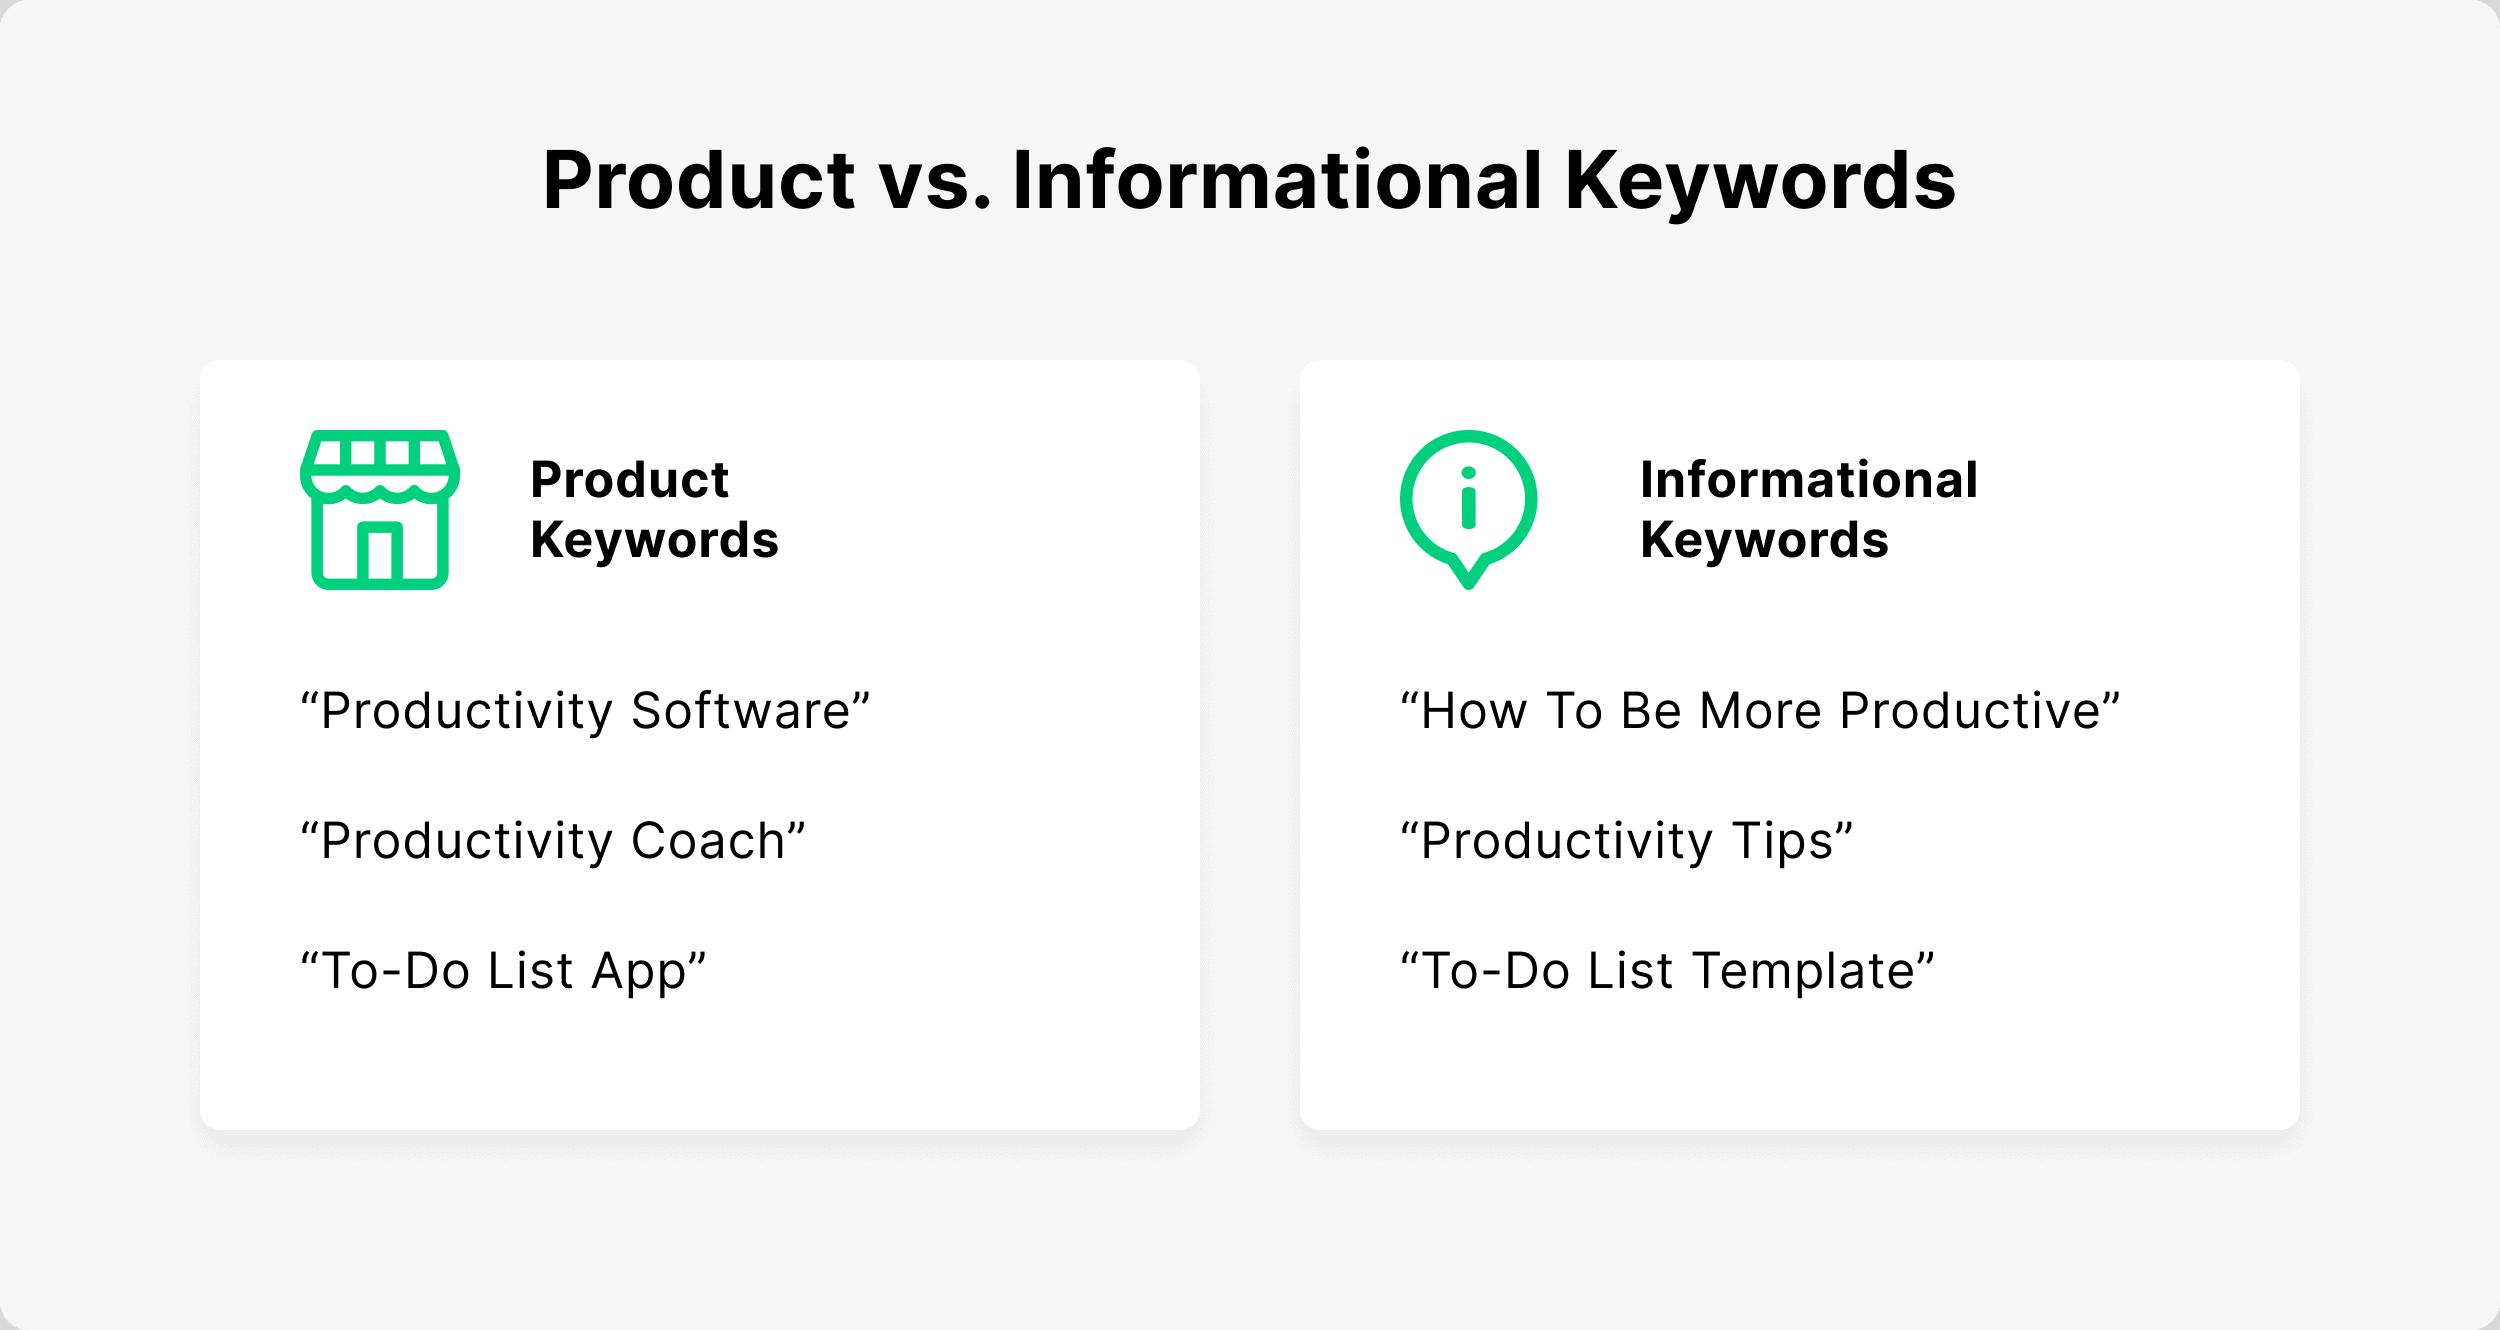 Product vs. Informational keywords